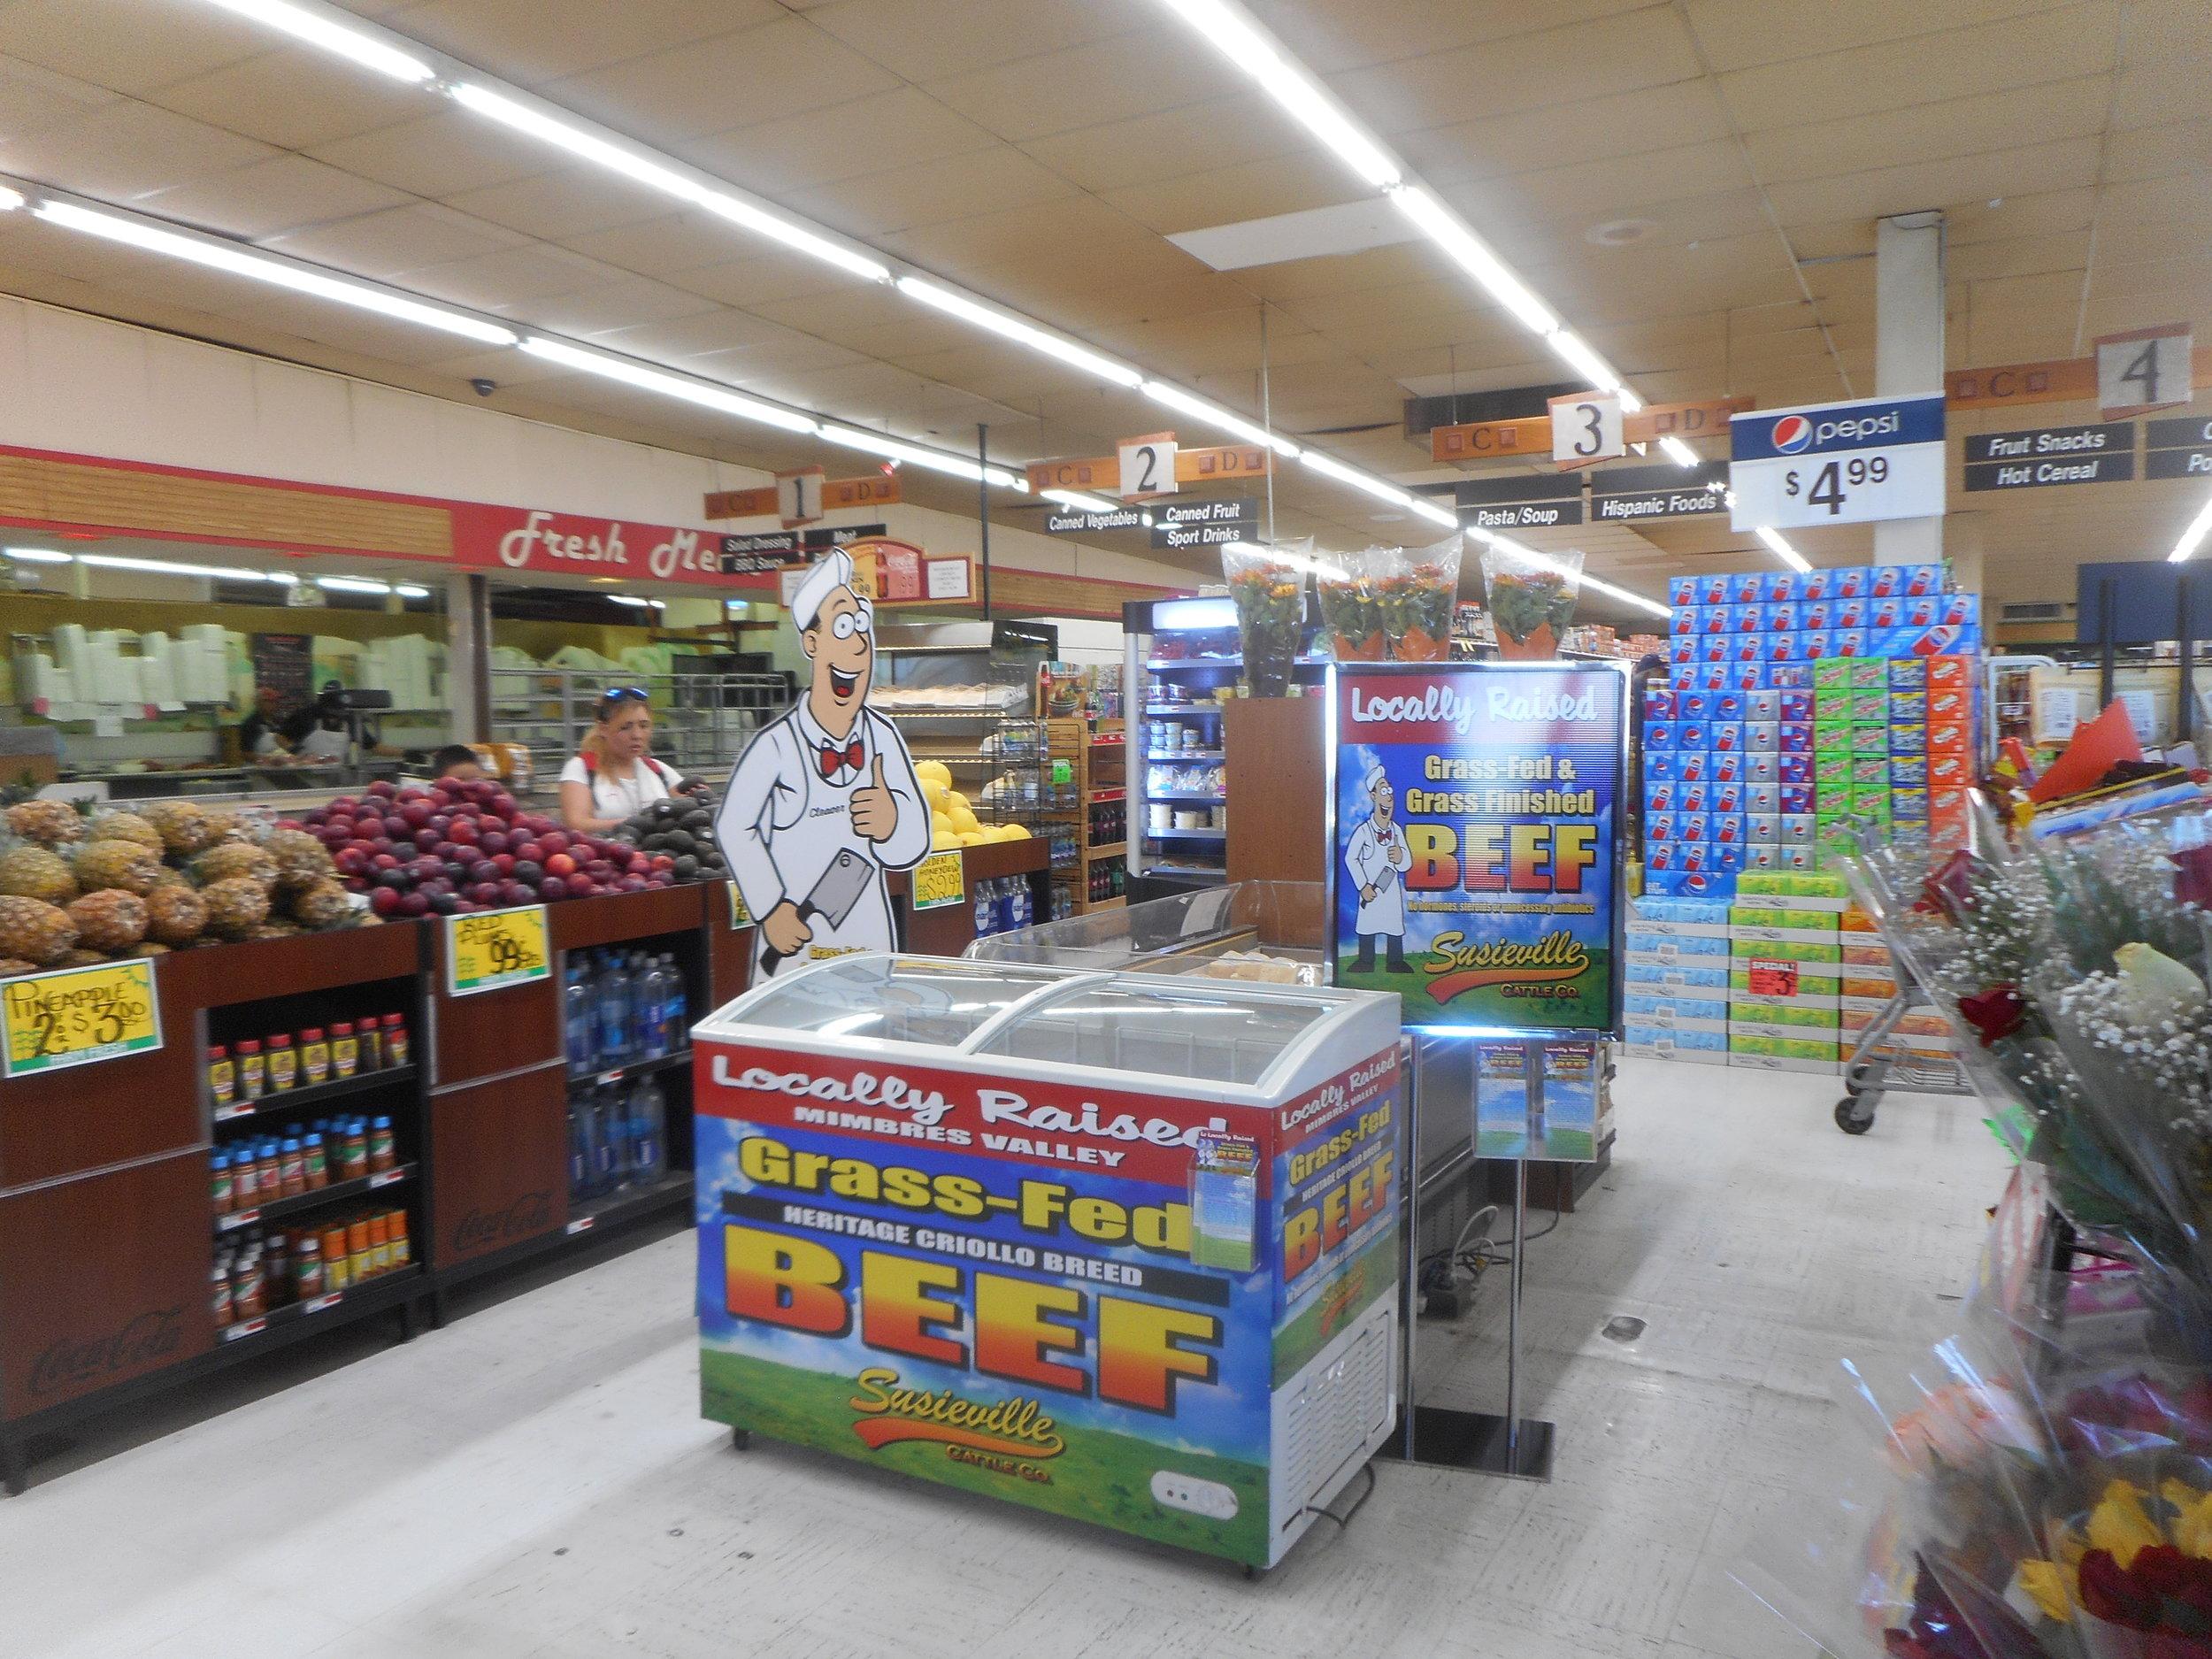 center market display.JPG